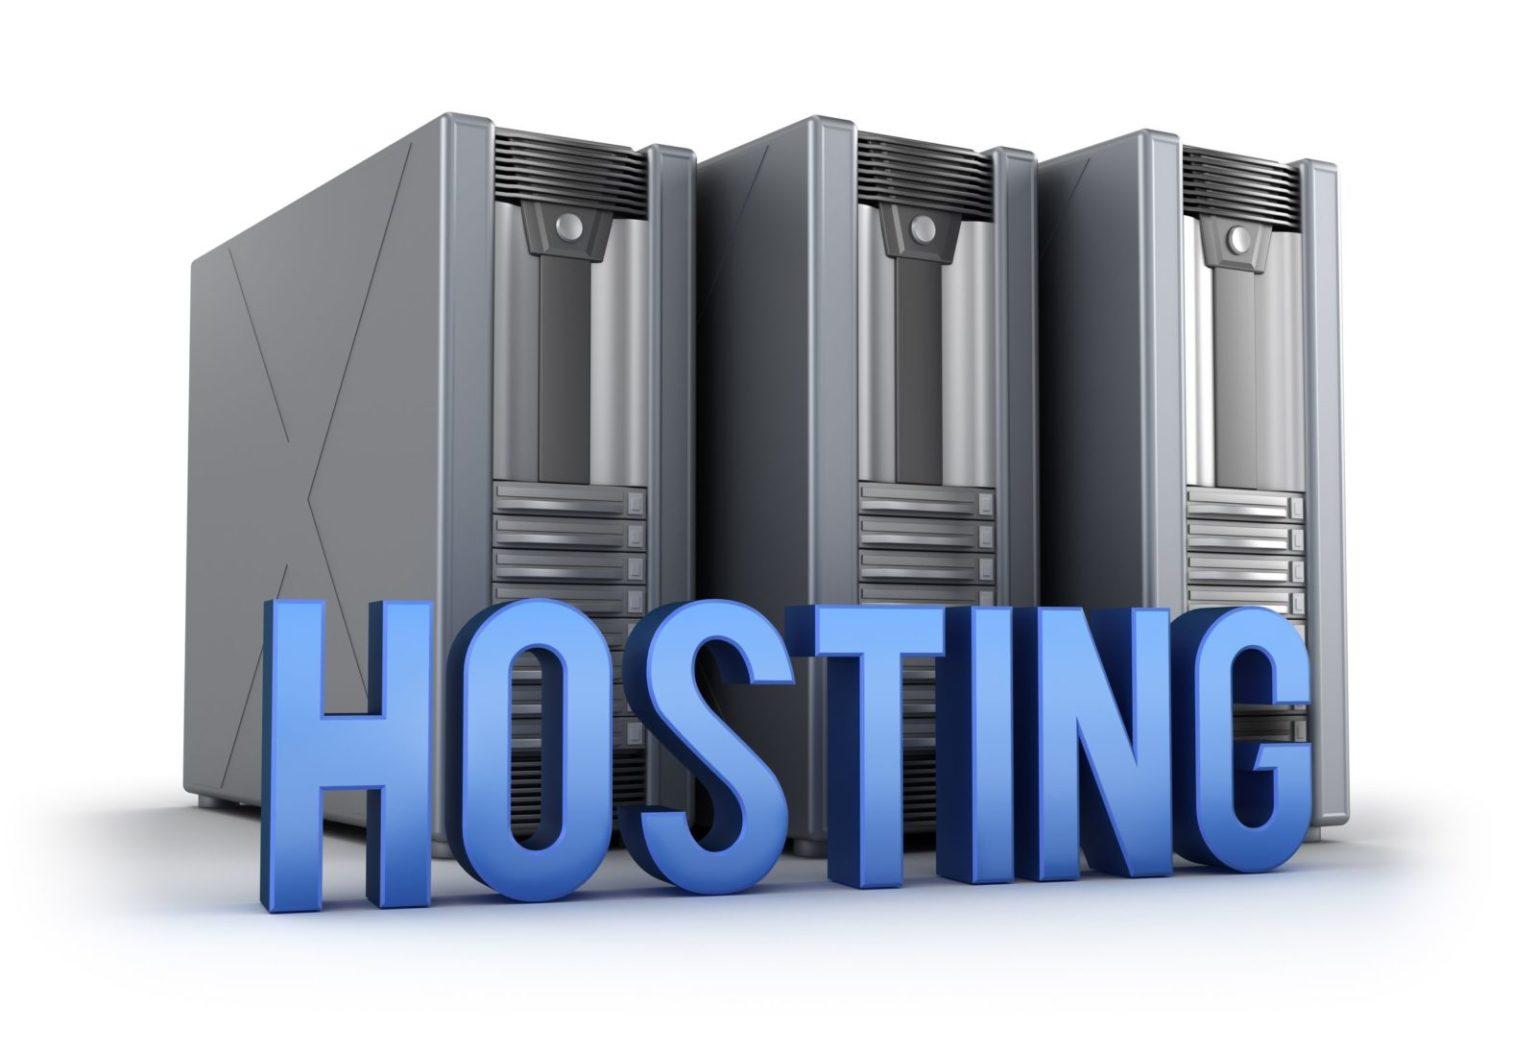 hosting-1536x1051.jpg